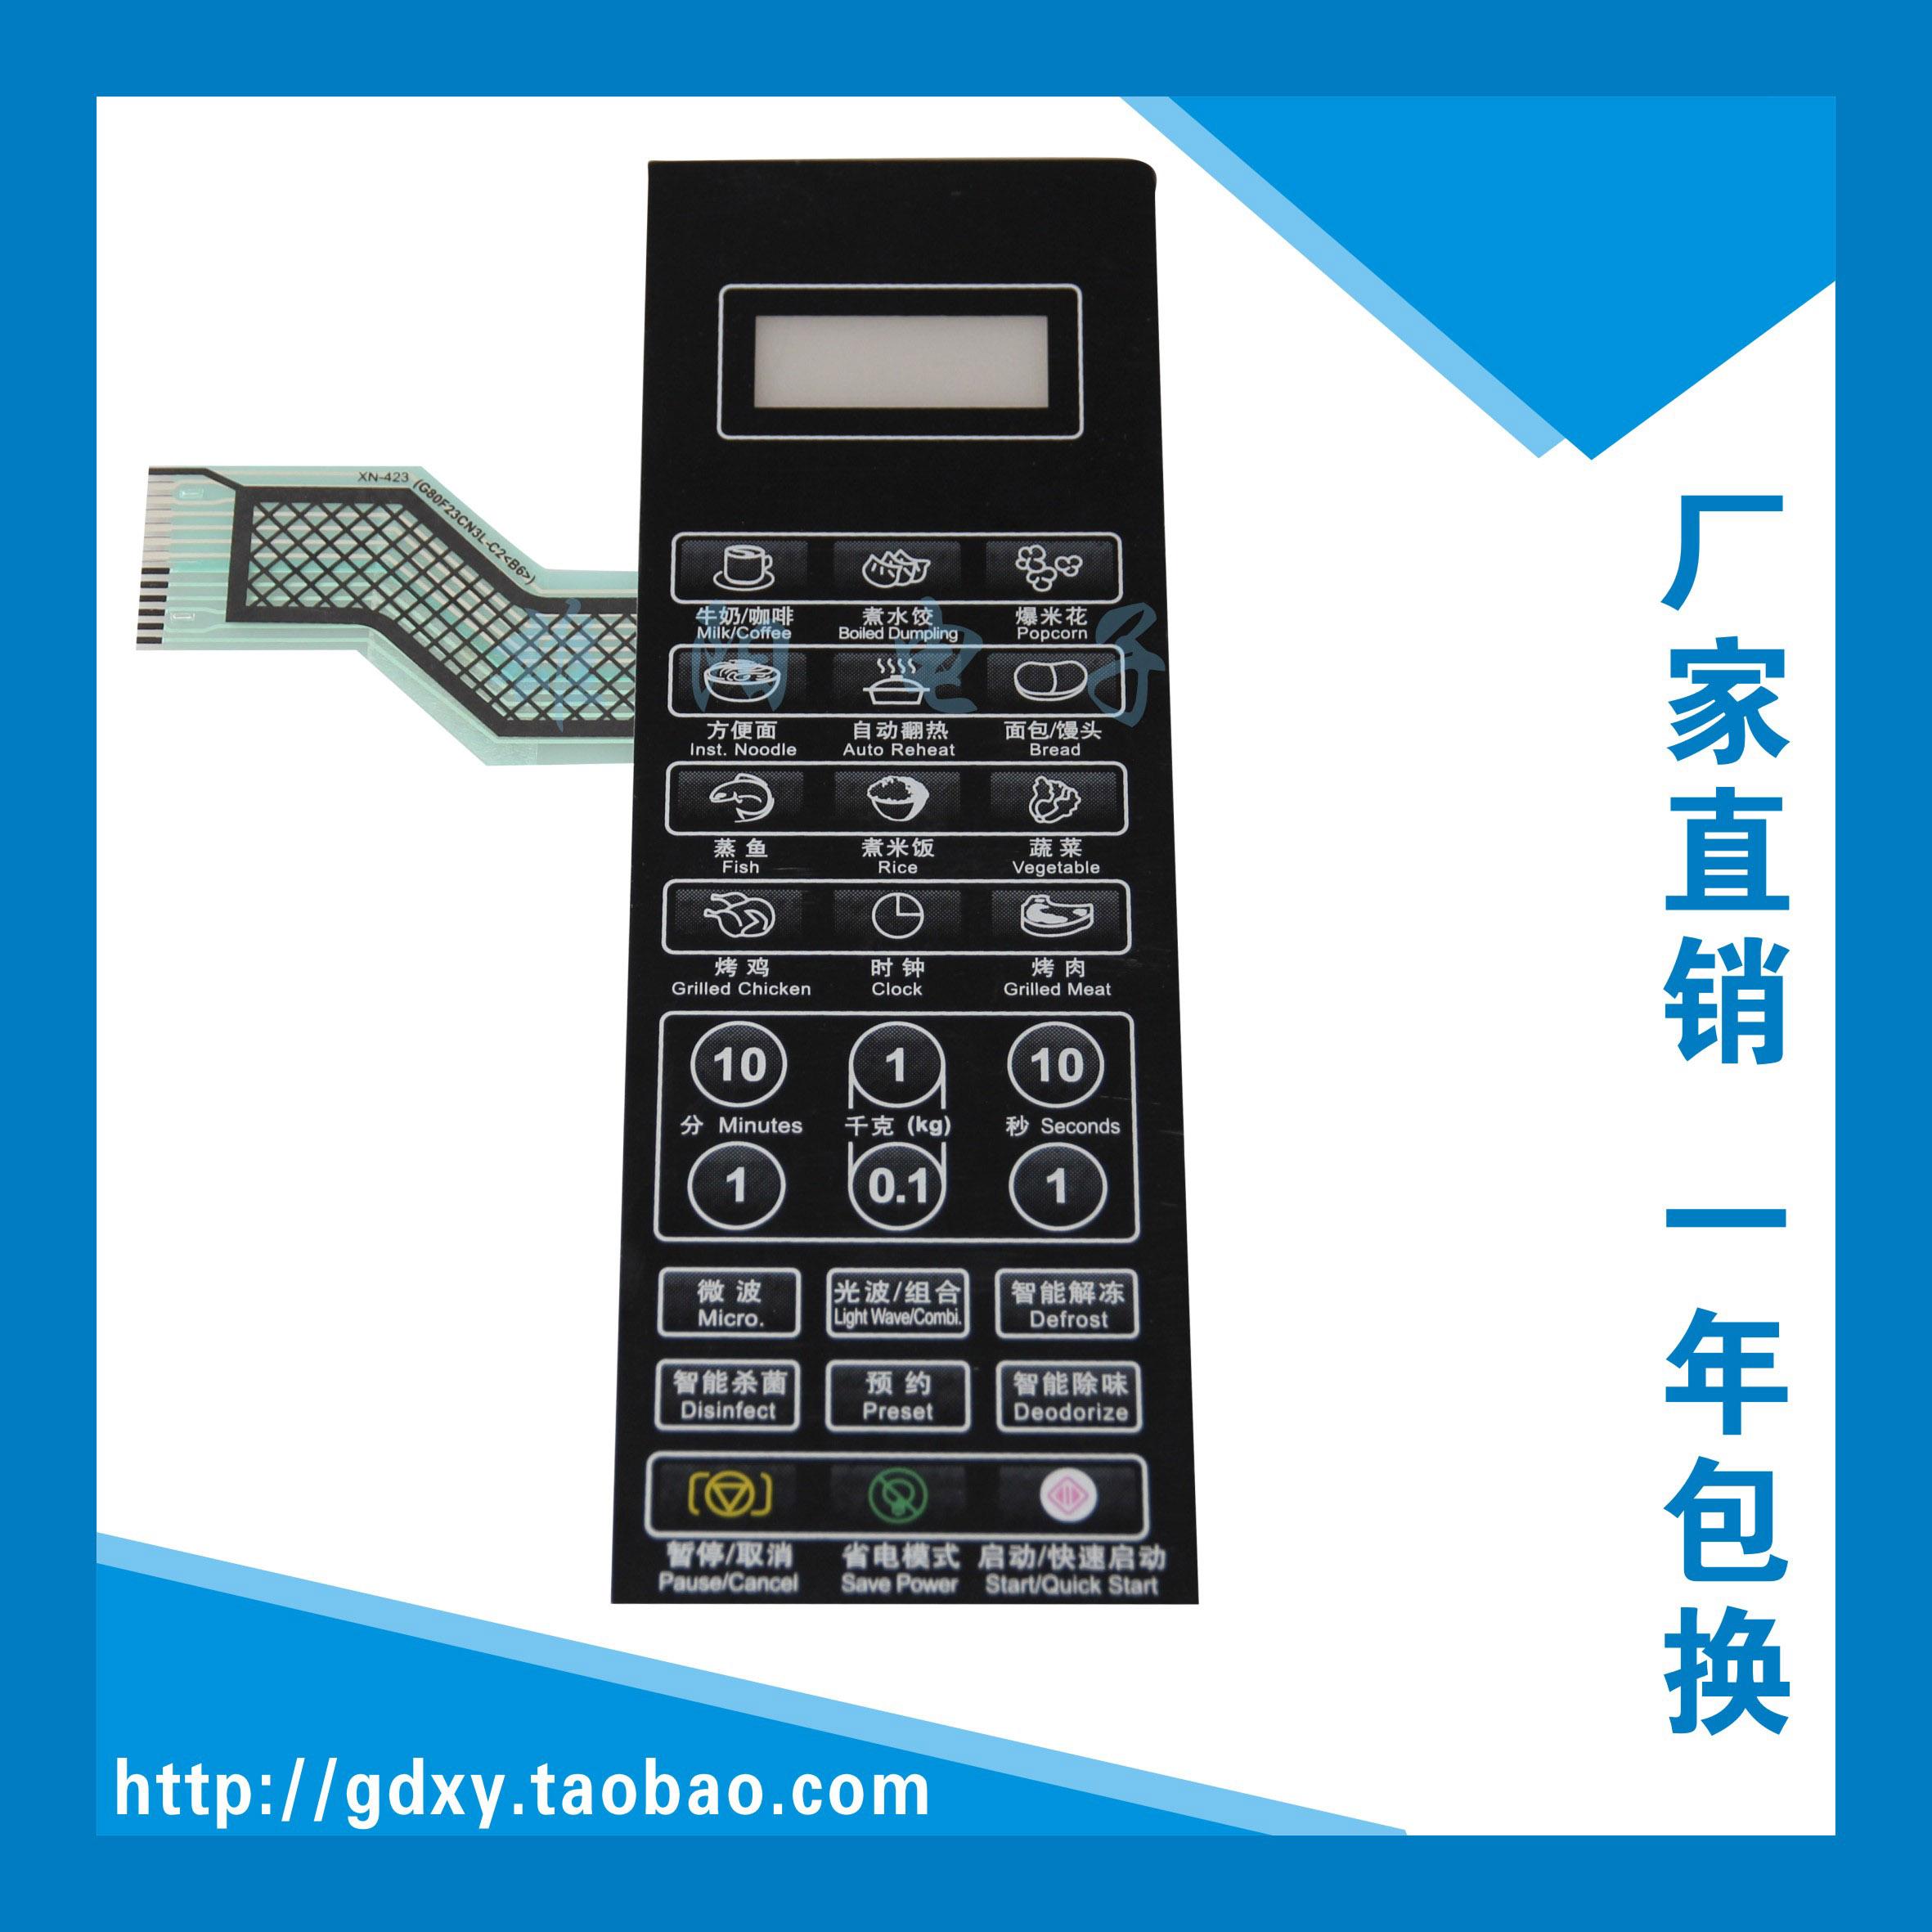 Mikrowellen glanz - film - G80F23CN3L-C2 (B6) - touch - tasten - Film control panel.